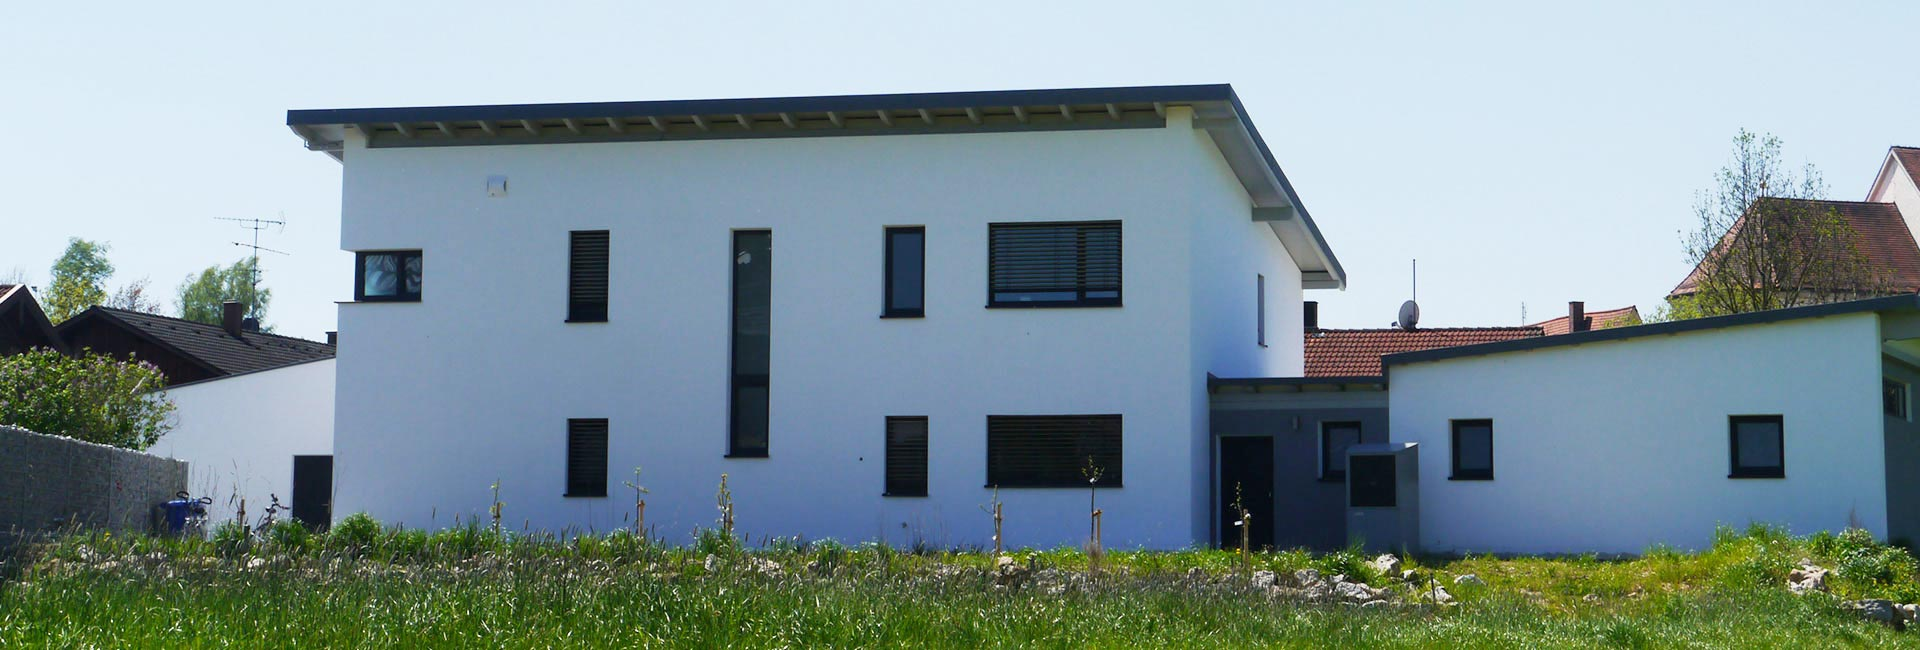 Duldinger Bau GmbH in Triftern